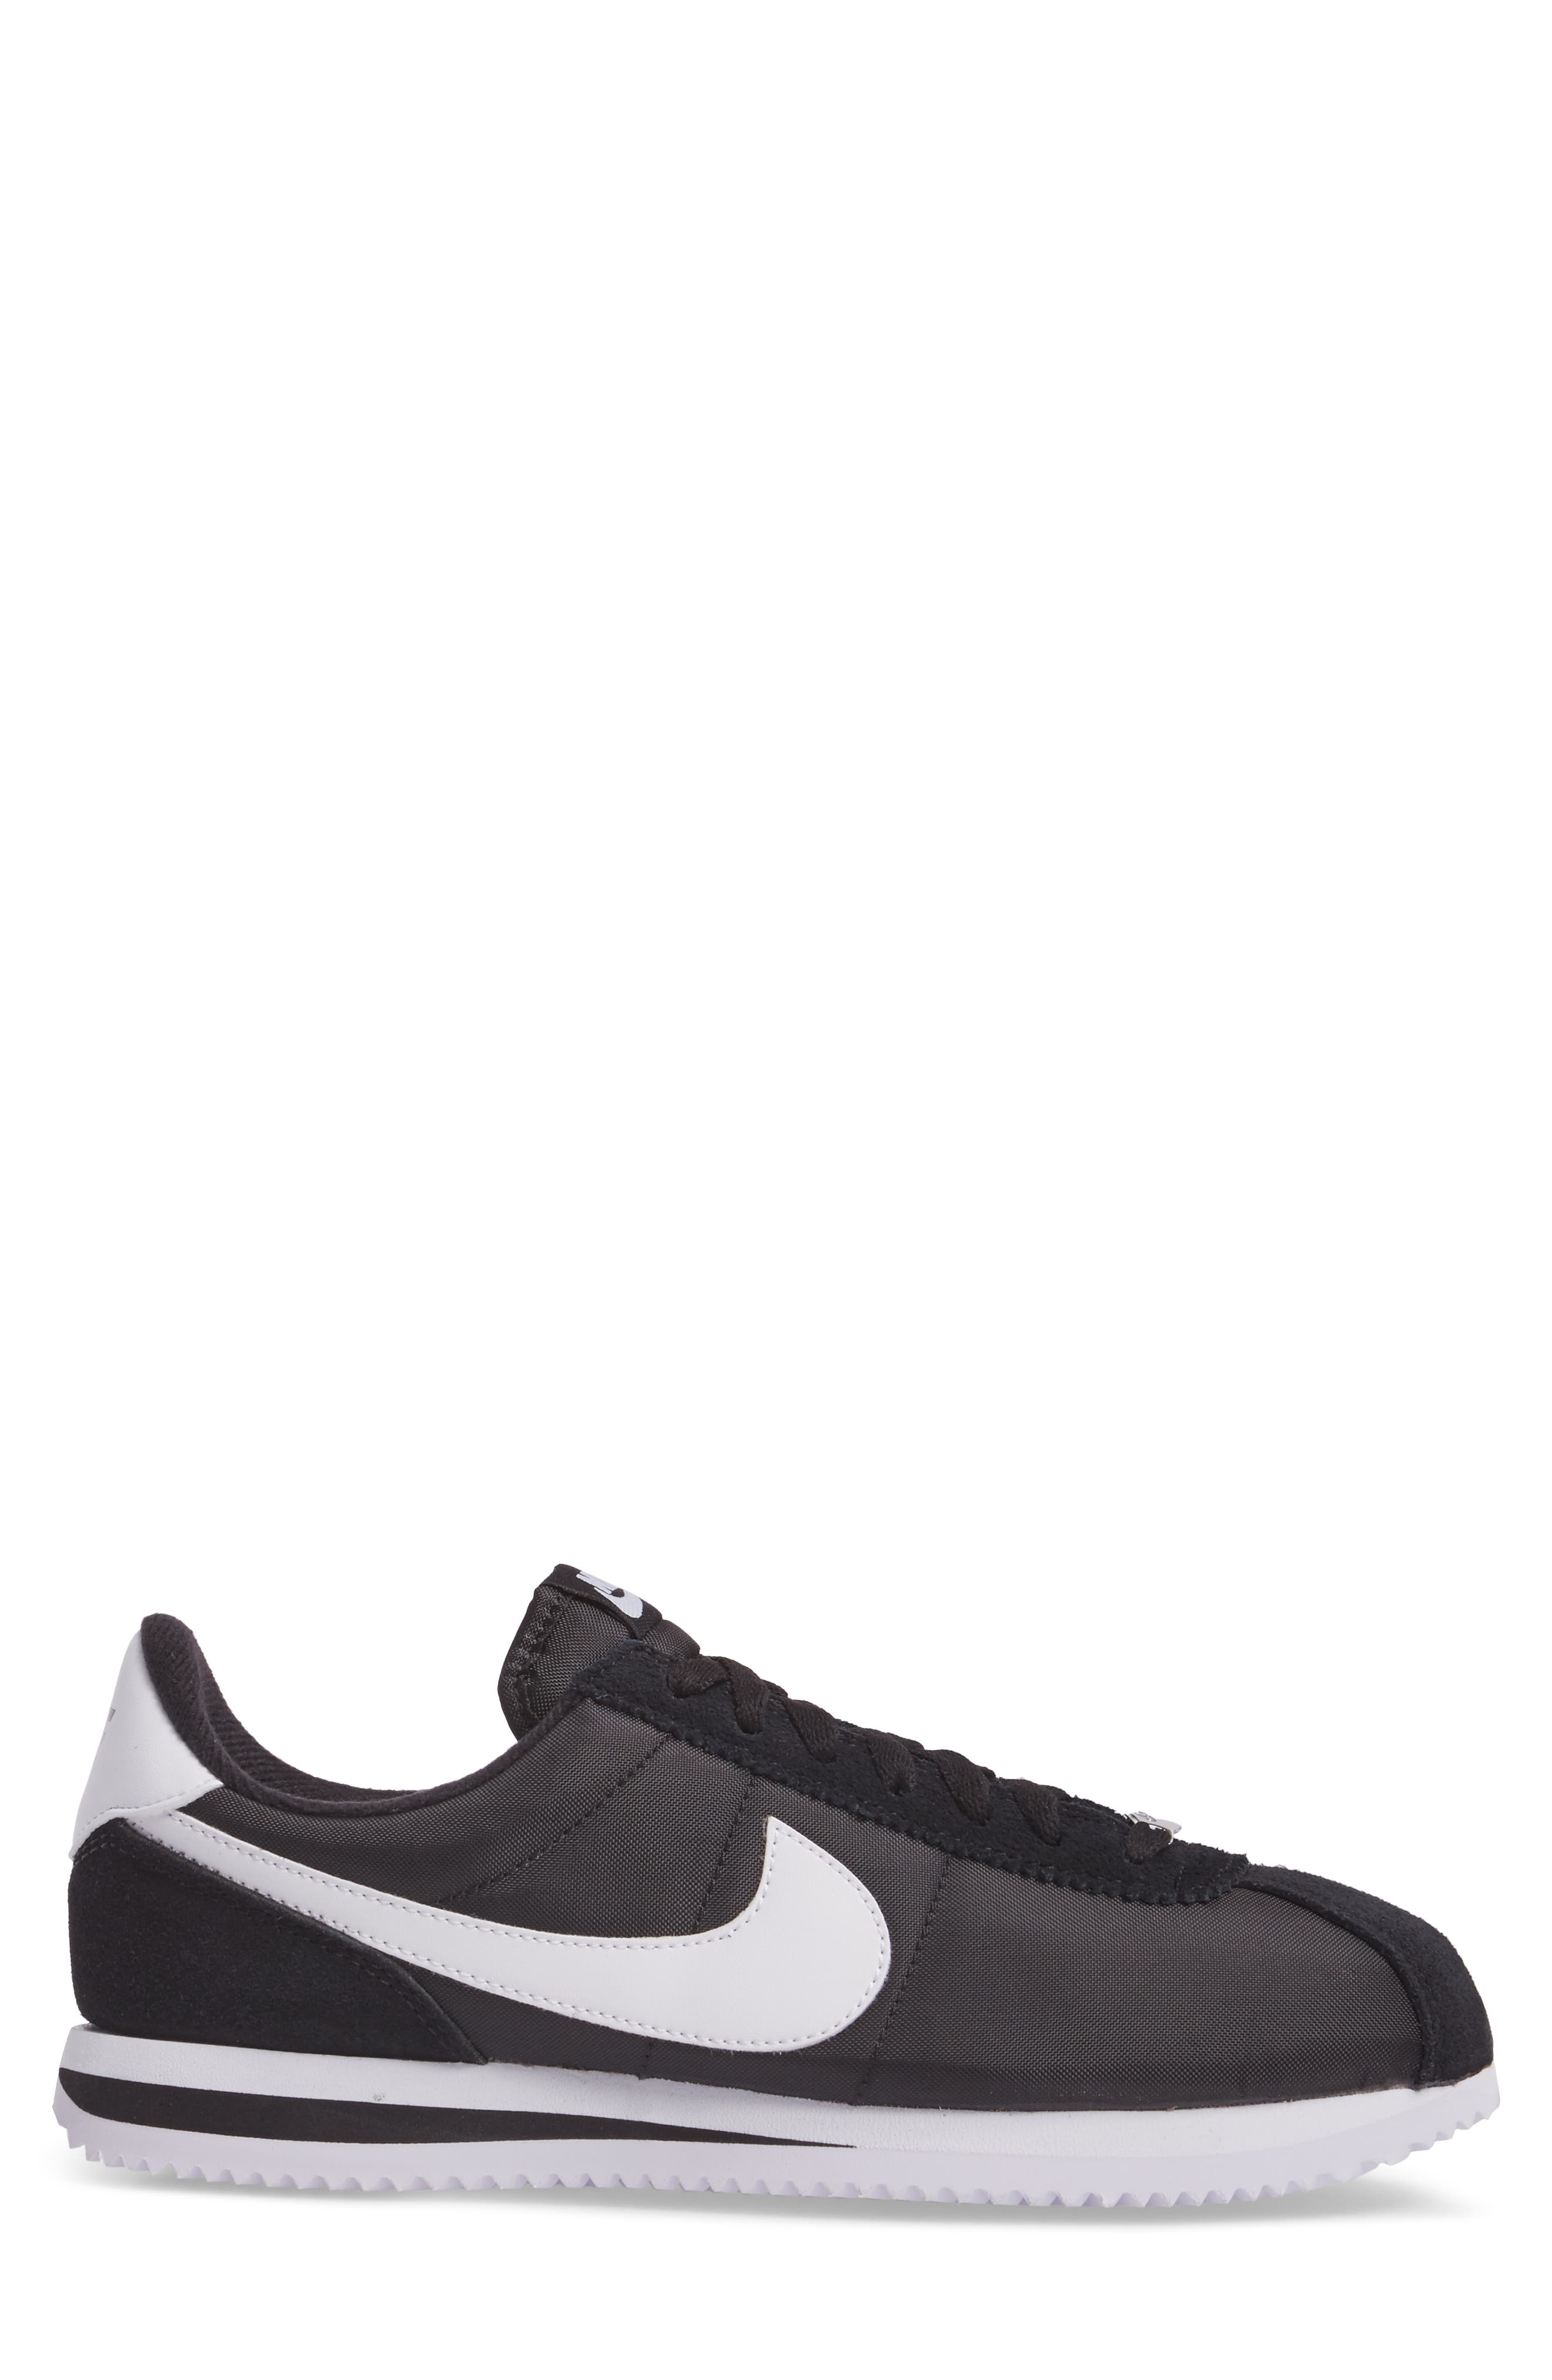 Cortez Basic Nylon Sneaker,                             Alternate thumbnail 3, color,                             BLACK/WHITE/METALLIC SILVER